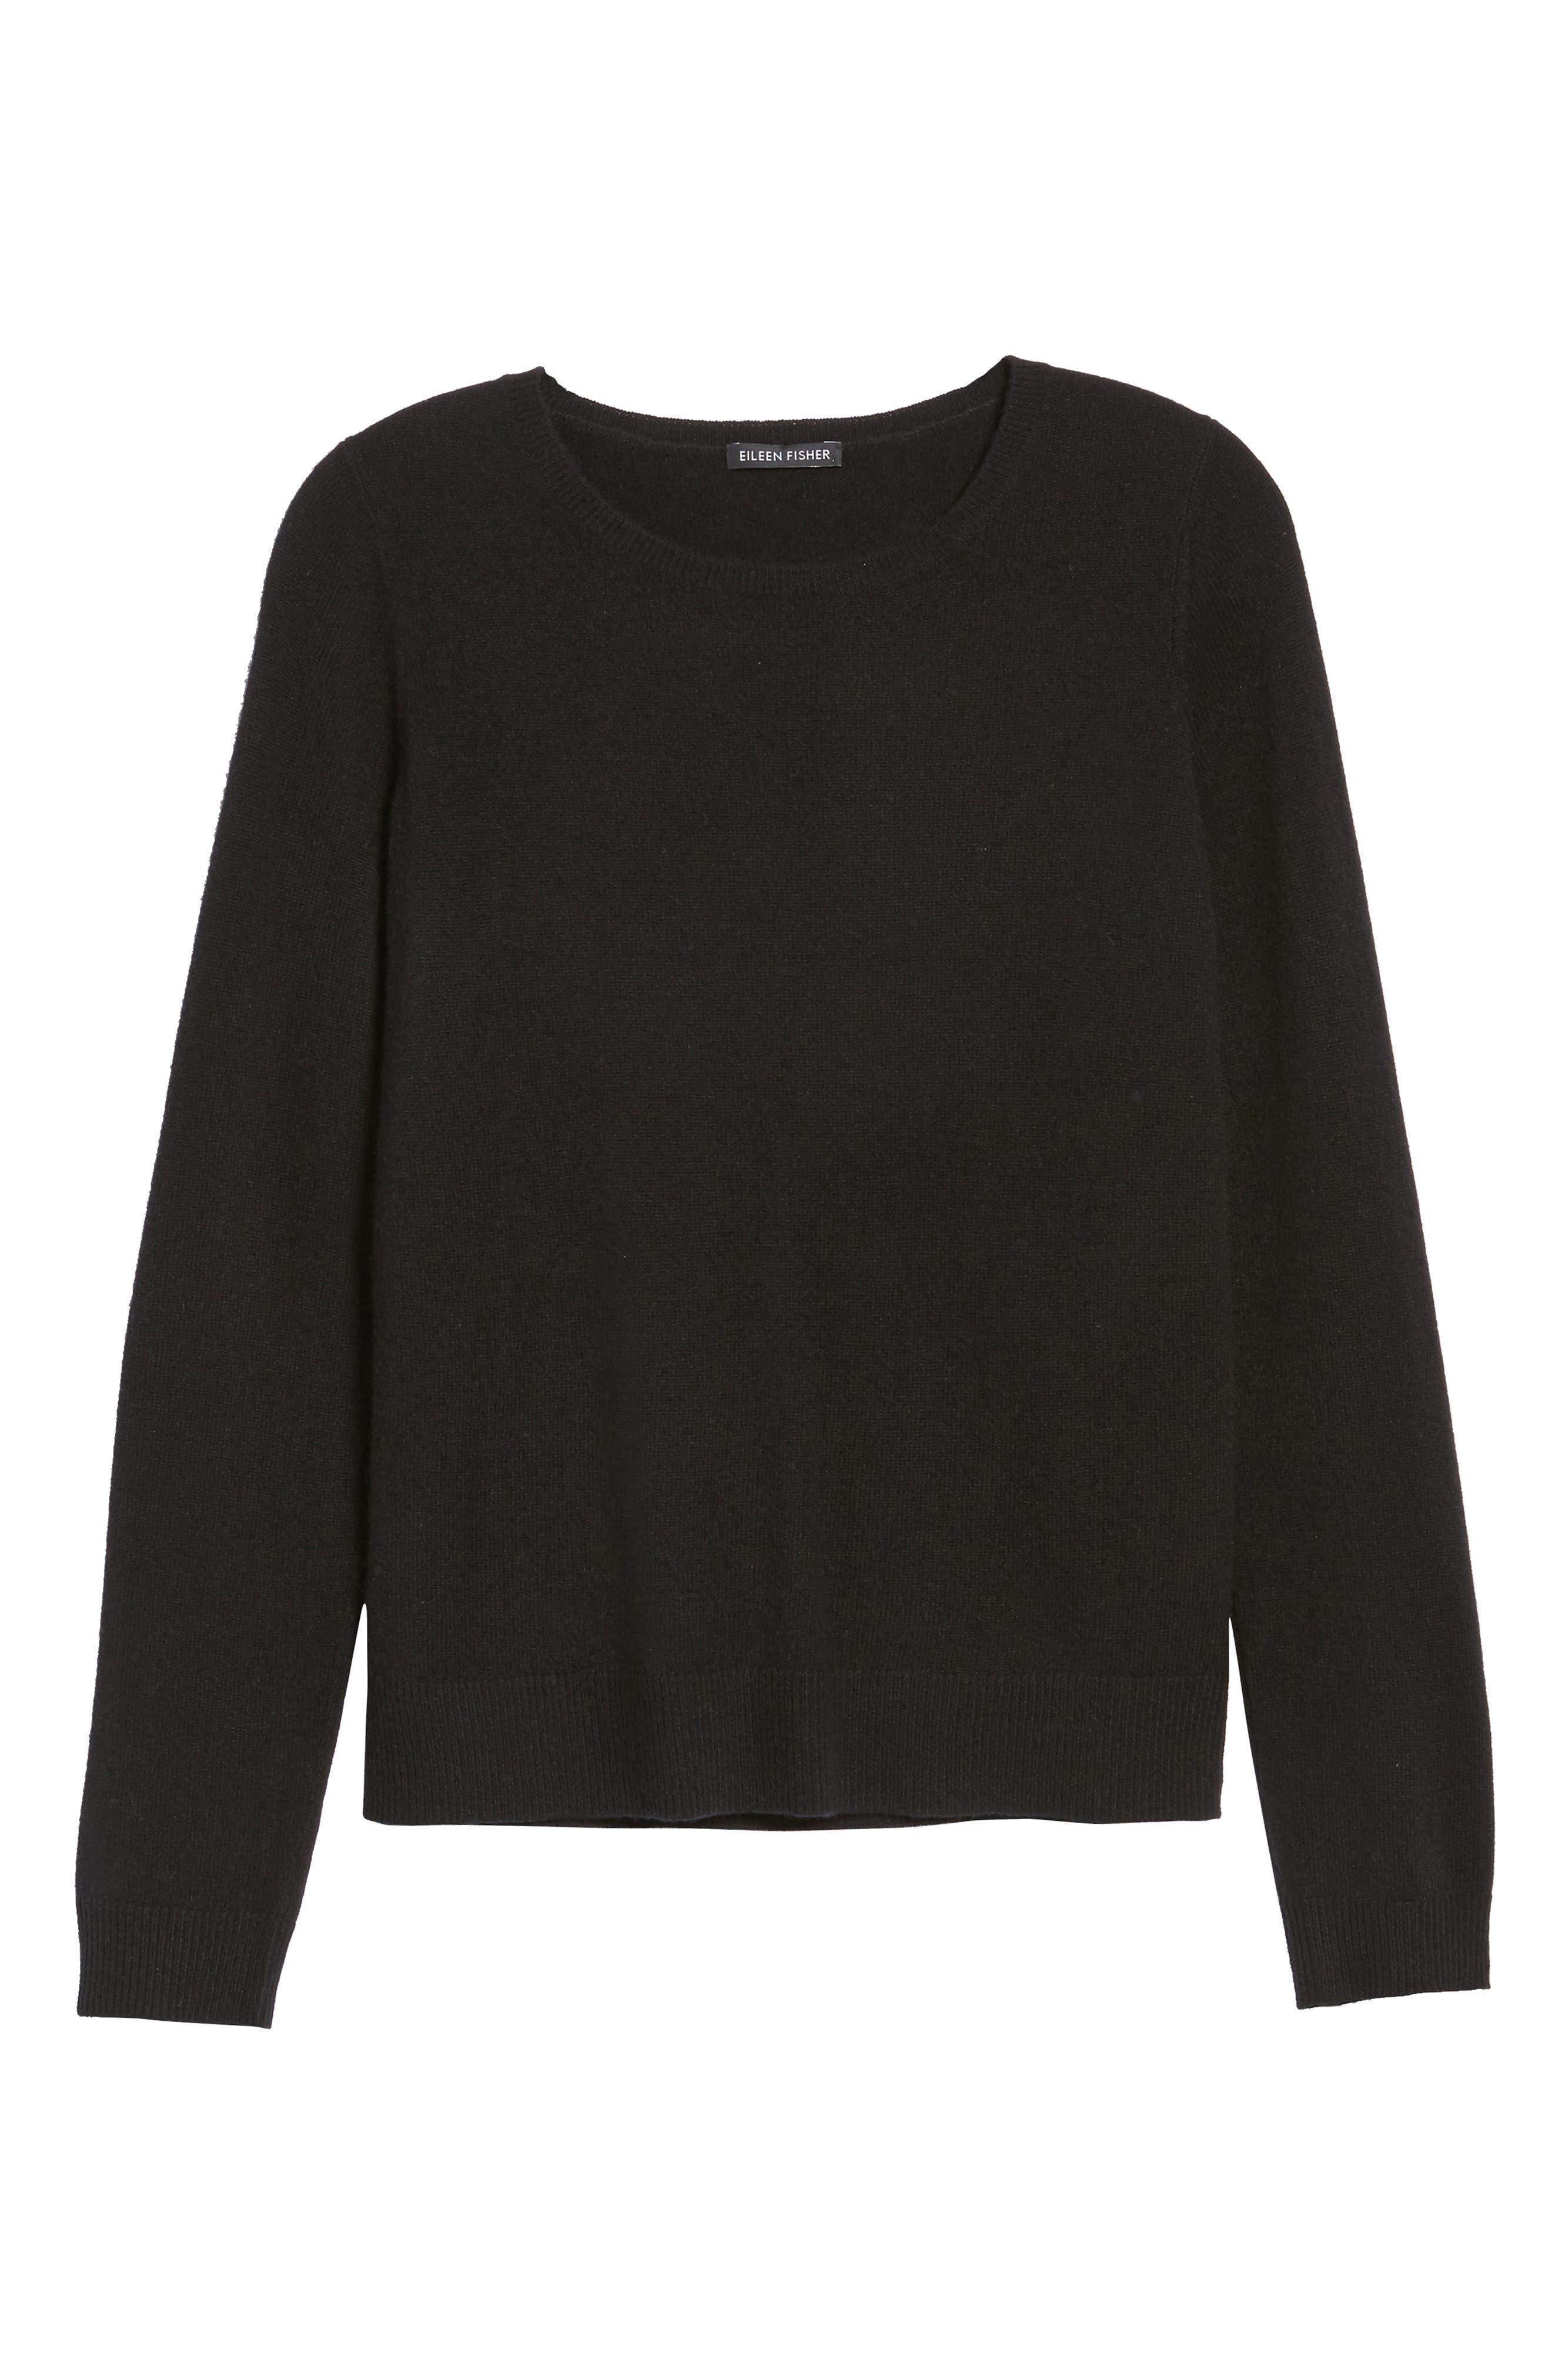 Cashmere Sweater,                             Alternate thumbnail 6, color,                             001